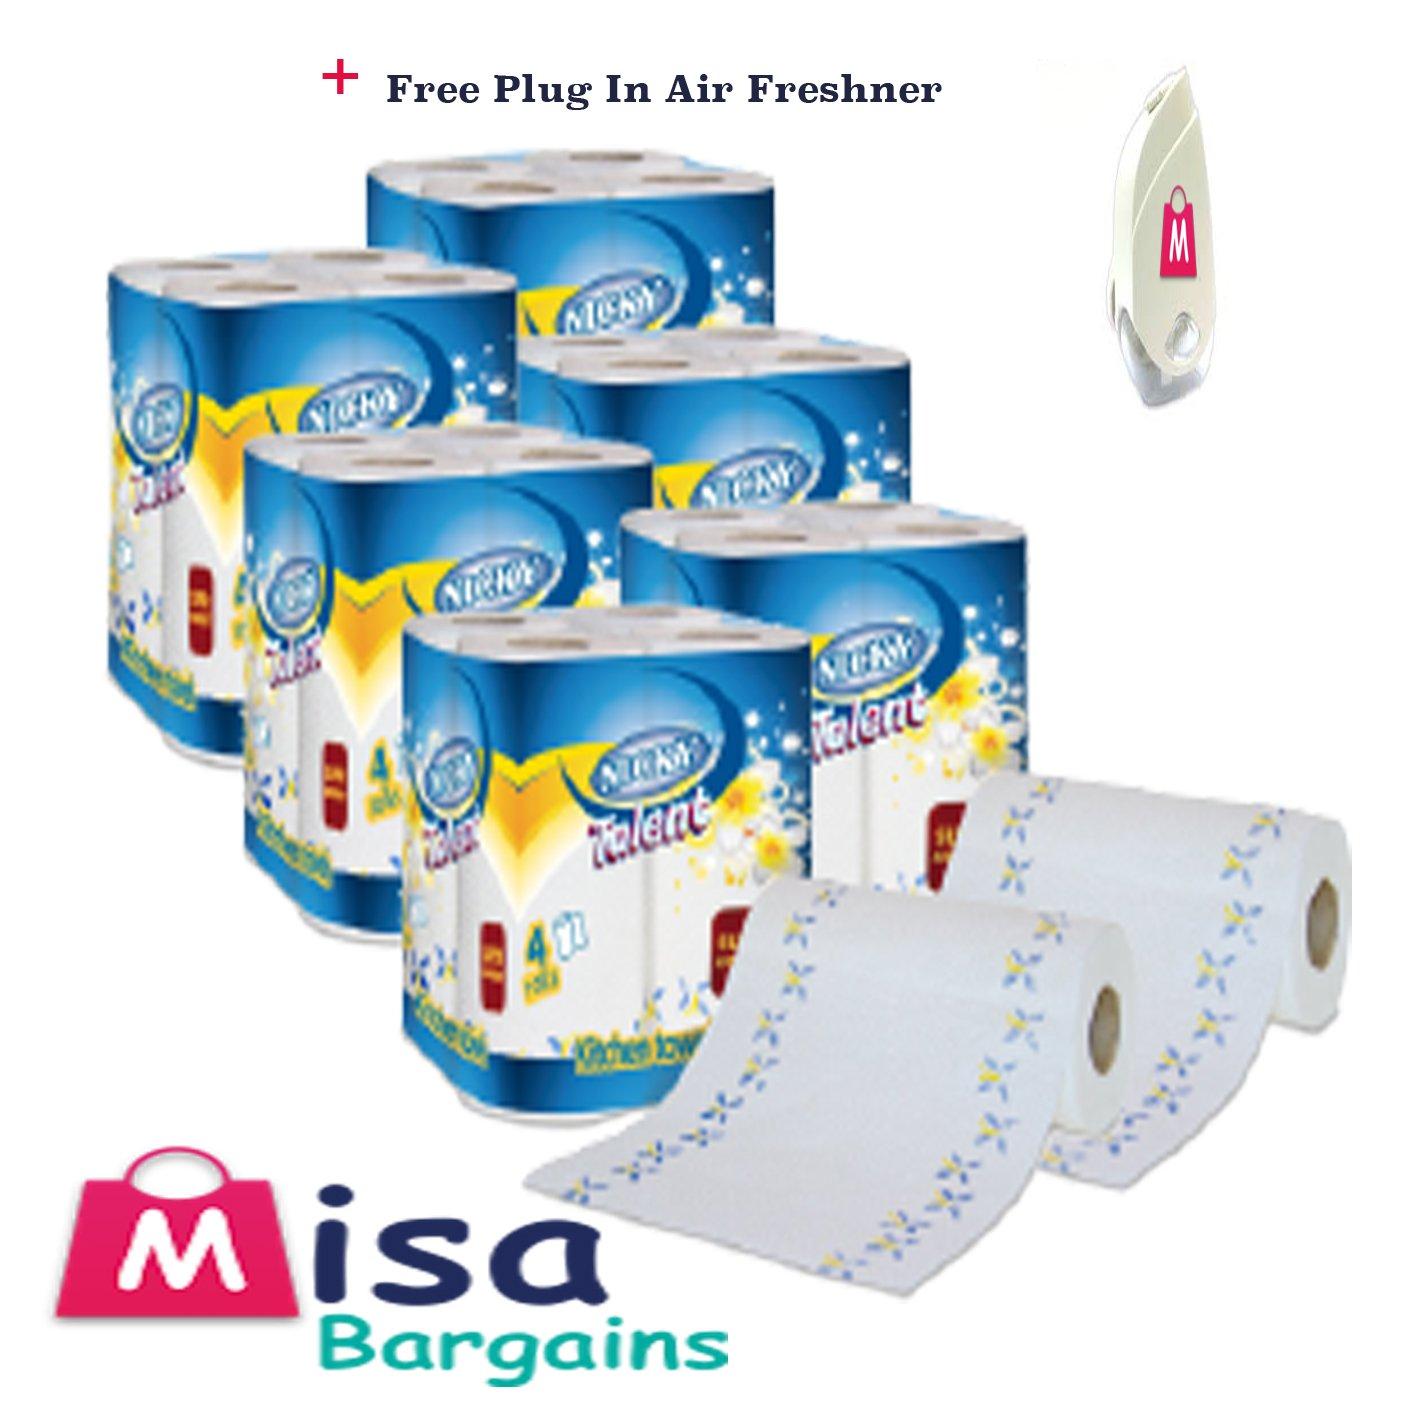 48 Rolls Nicky Talent Kitchen Towels Super Absorbent Printed Design + Misa gift